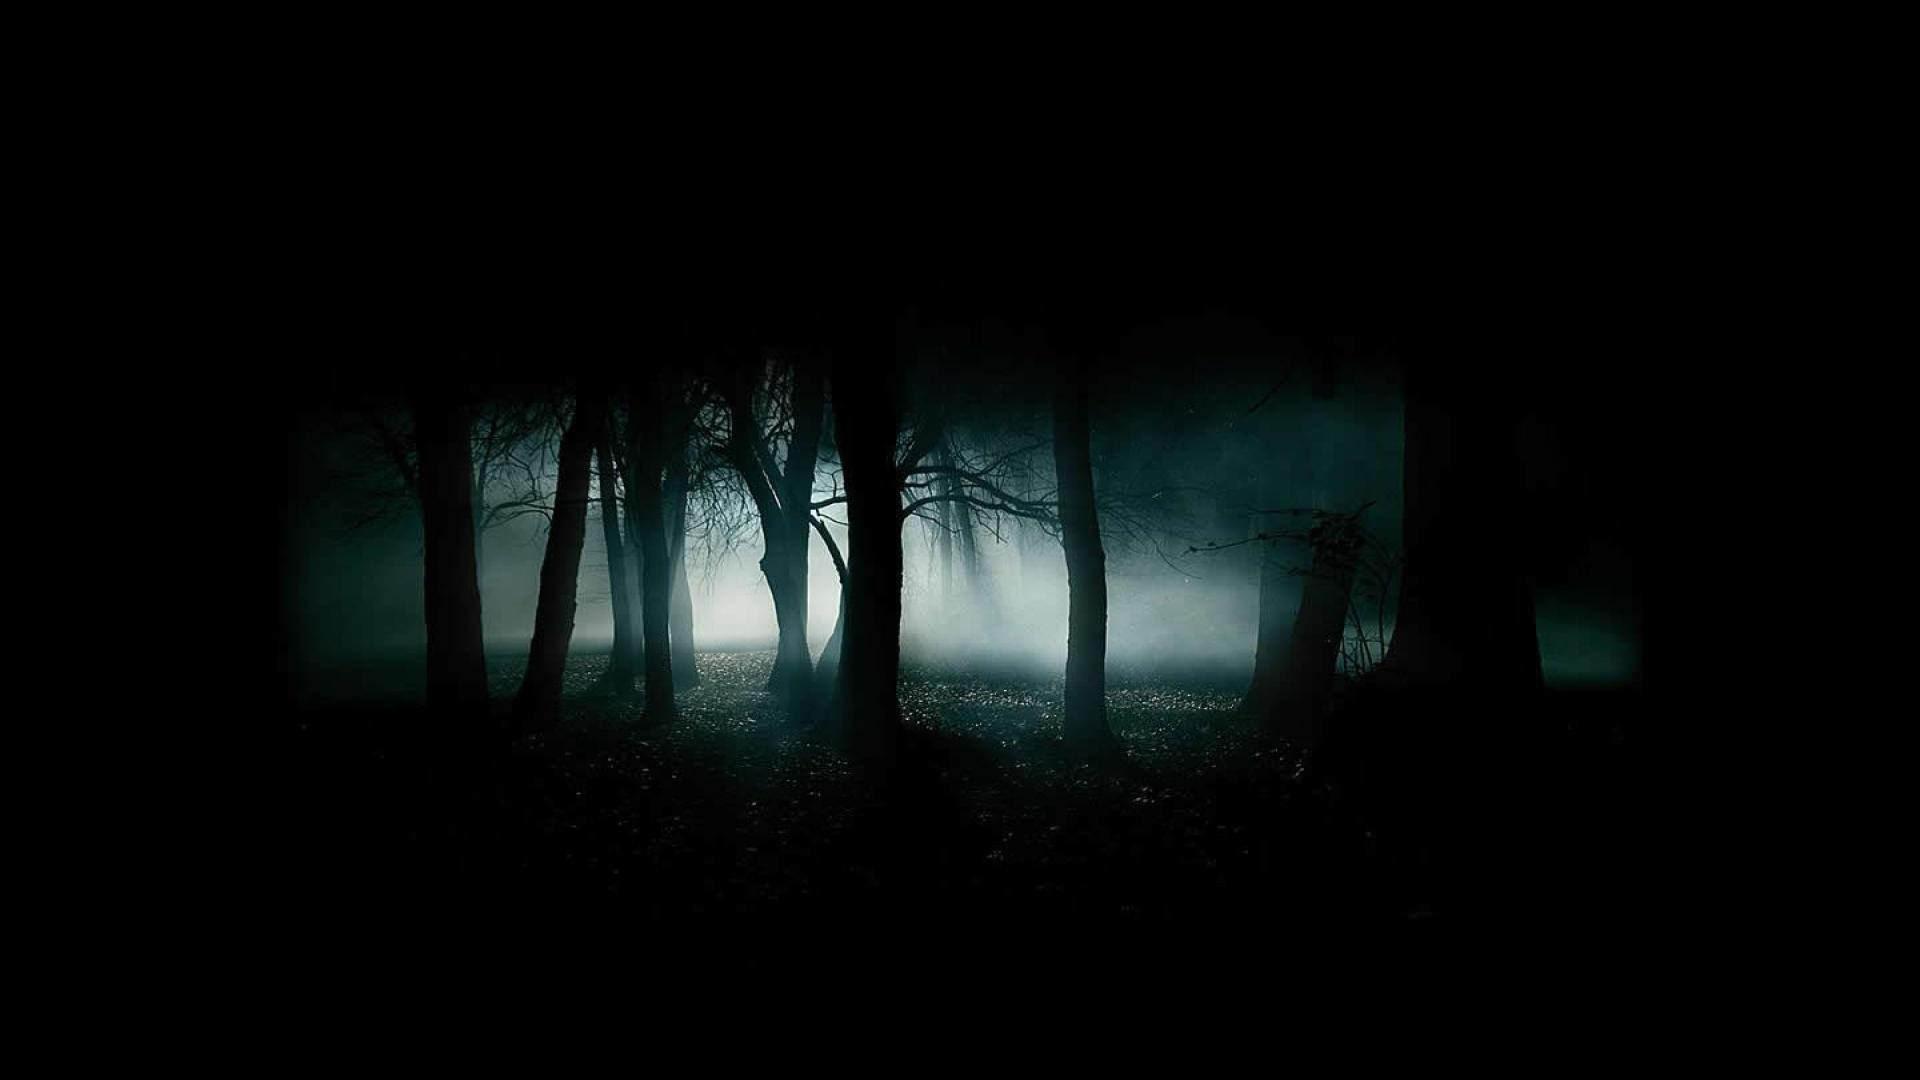 Dark Scary Forest Background